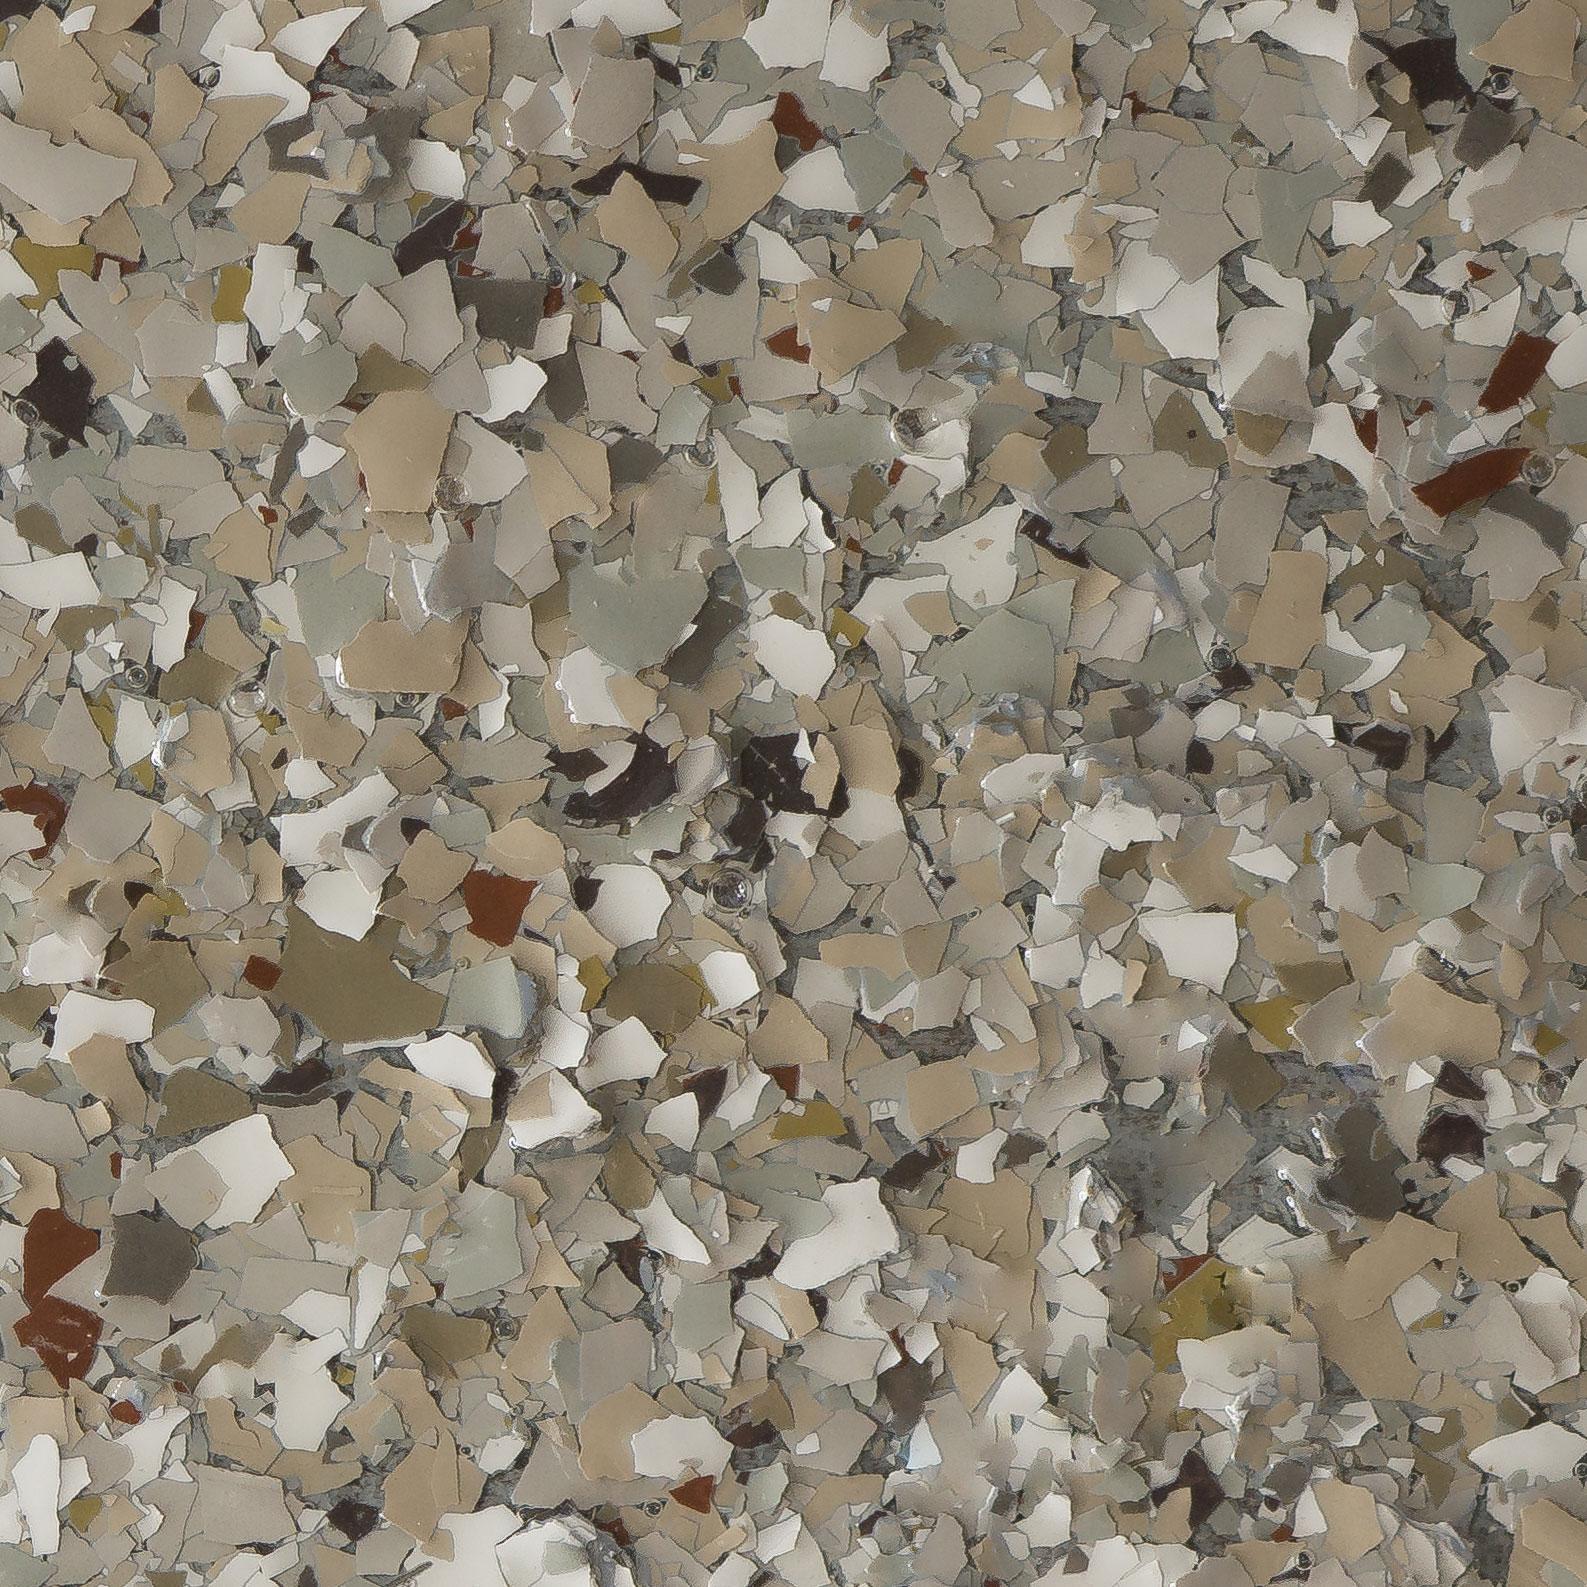 Garage Doctors Easy Clean Flooring in Florida platinum-granite-mars-gray